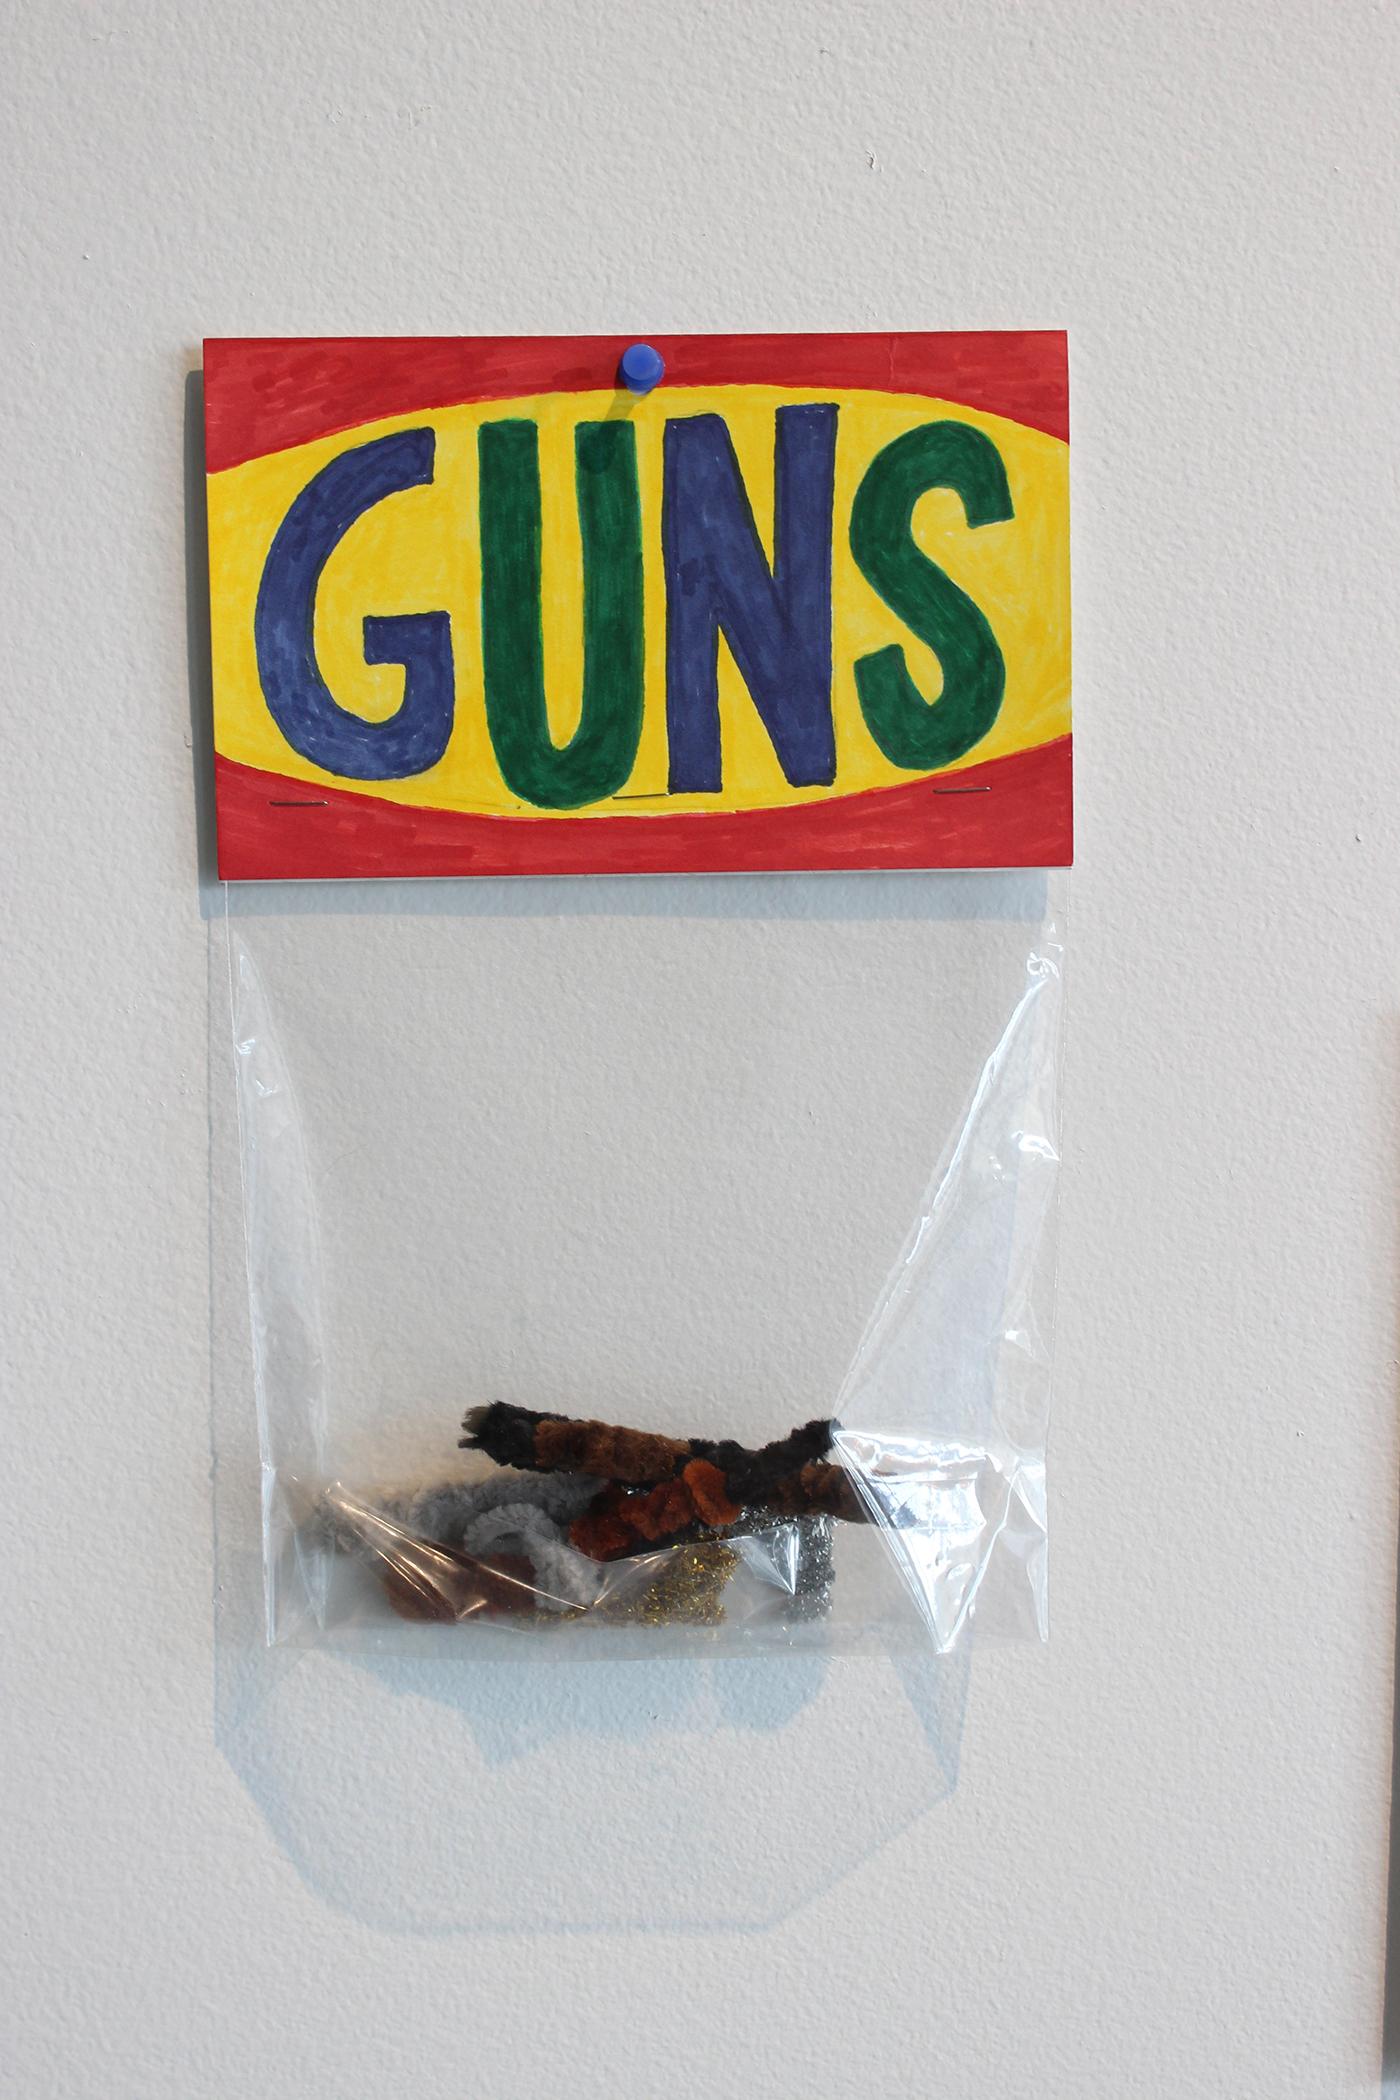 Guns (2014) by Don Porcello